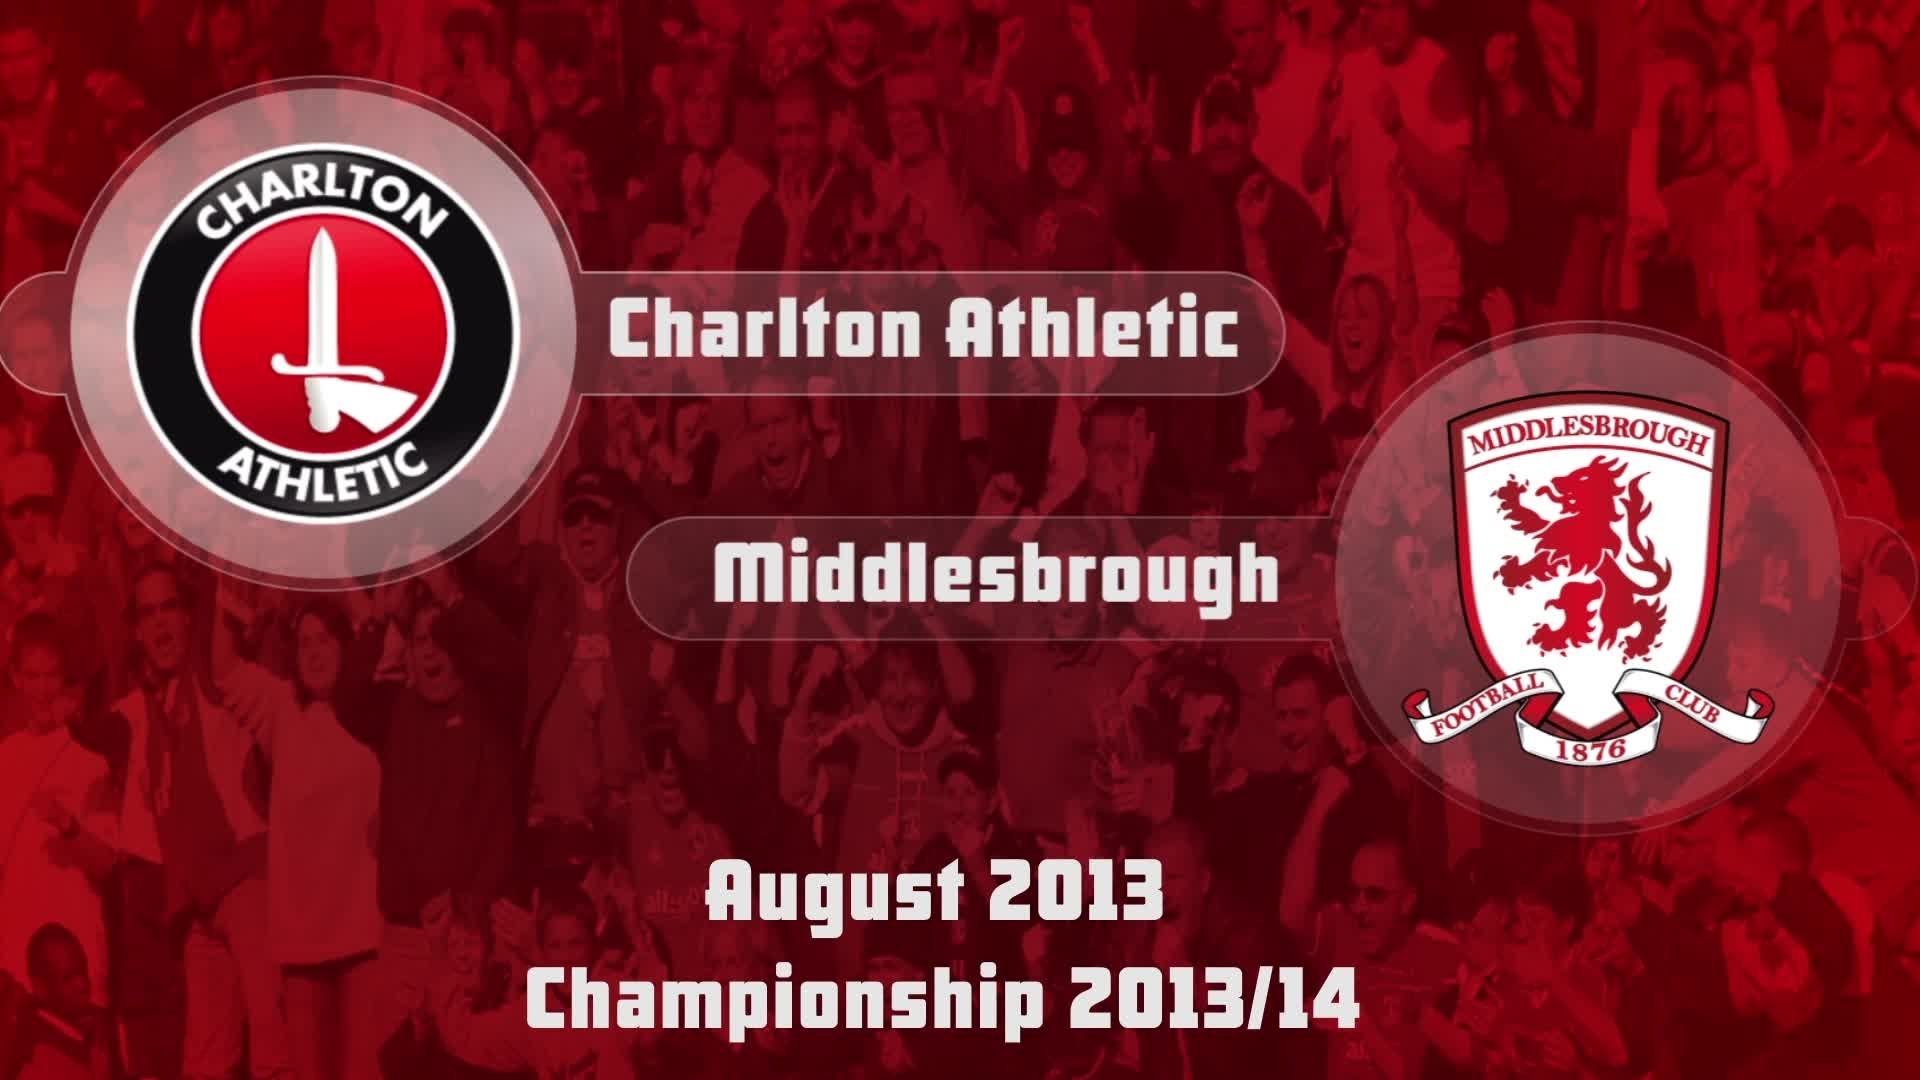 03 HIGHLIGHTS | Charlton 0 Middlesbrough 1 (Aug 2013)